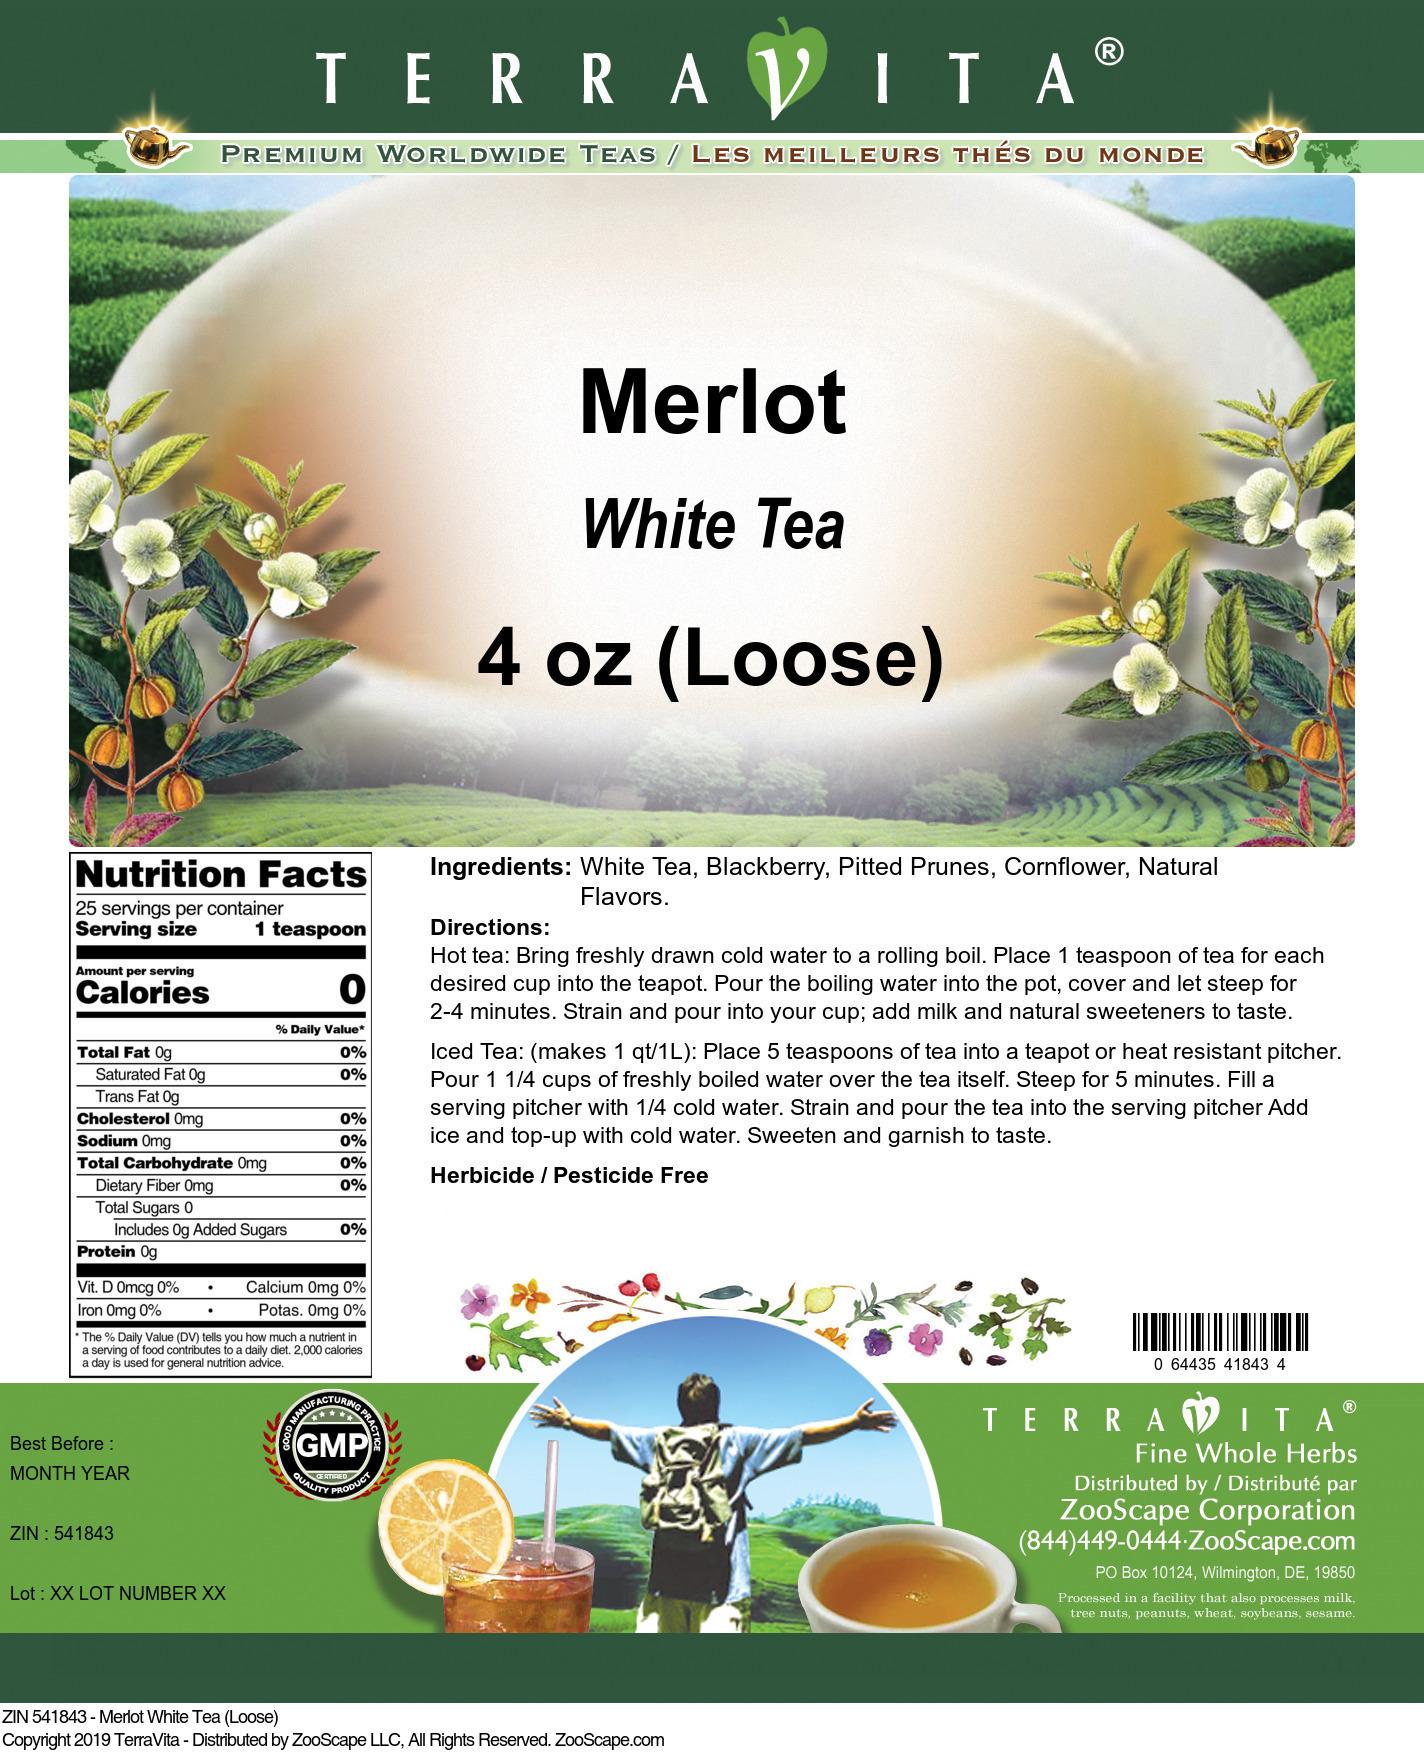 Merlot White Tea (Loose)